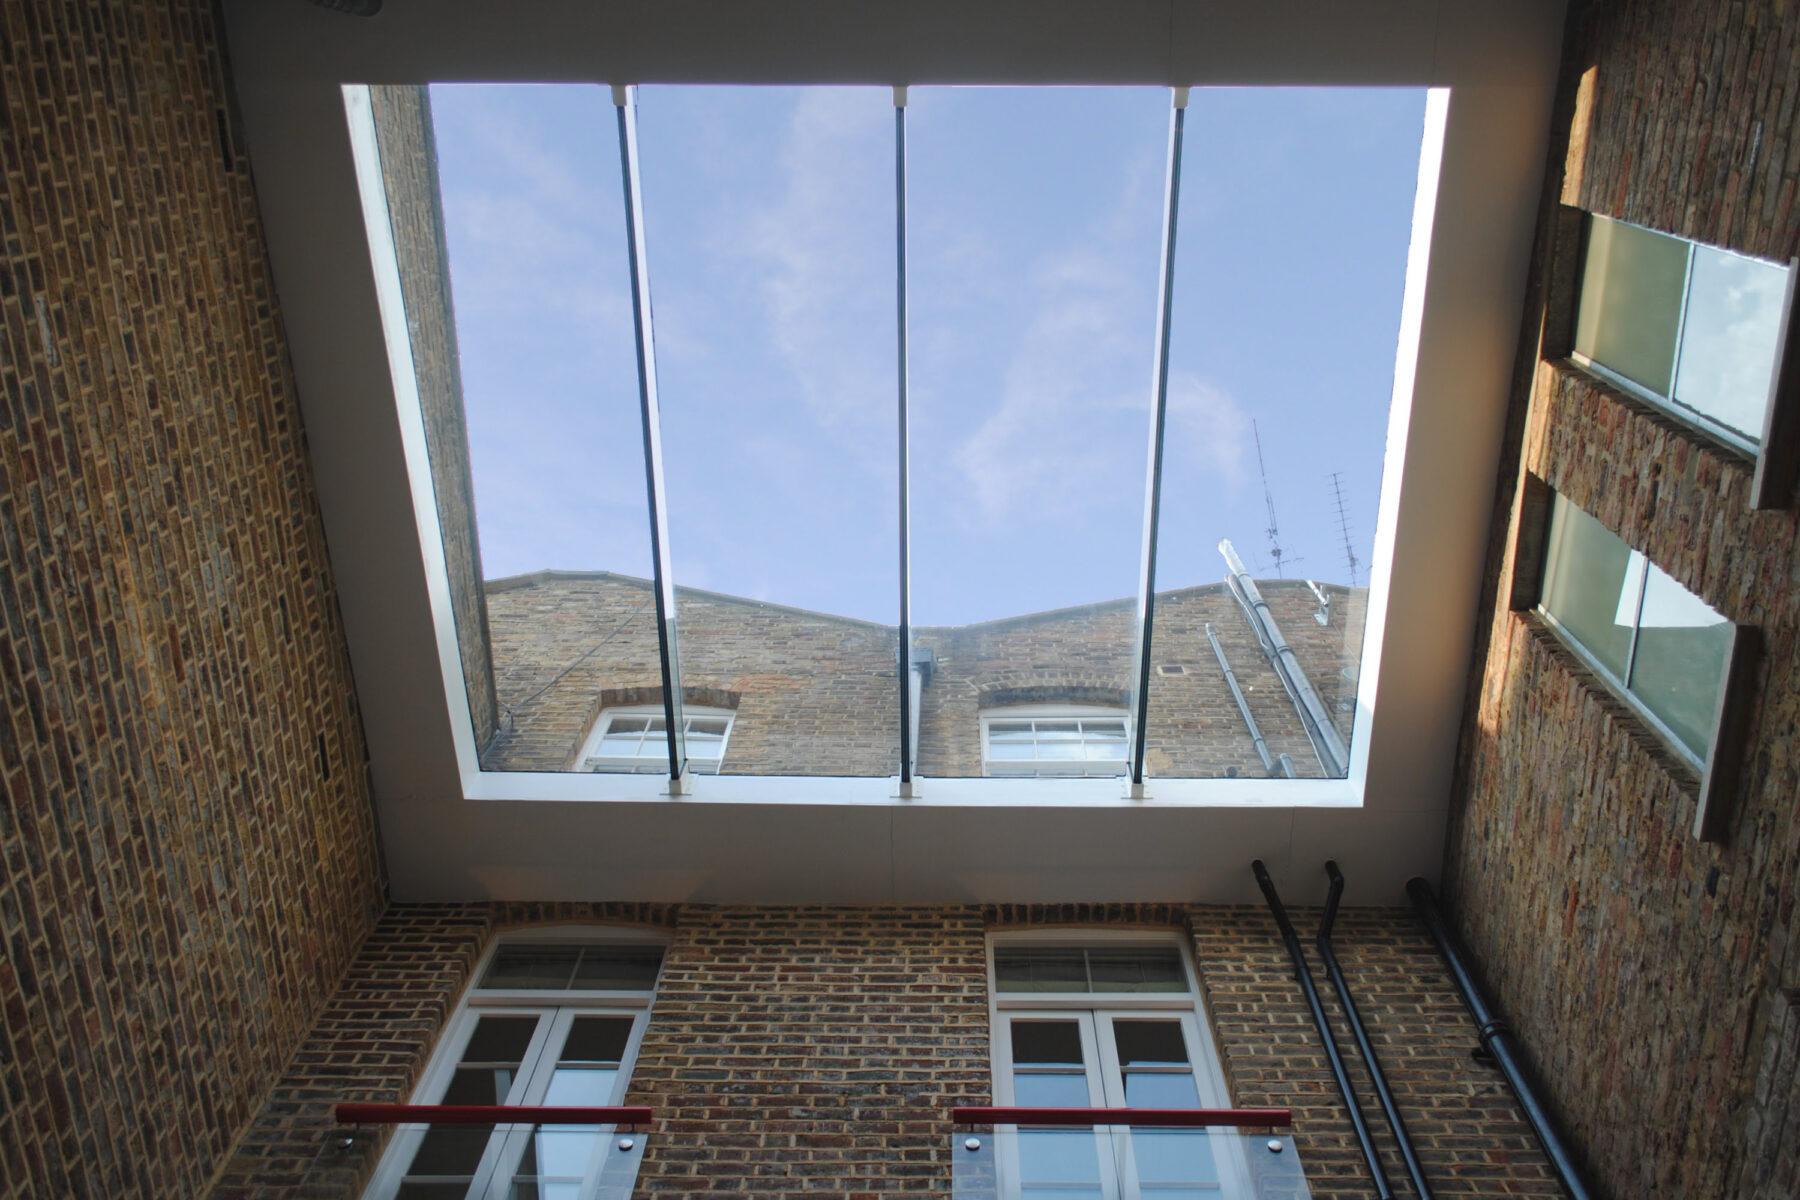 Photo of glazed canopy over lightwell